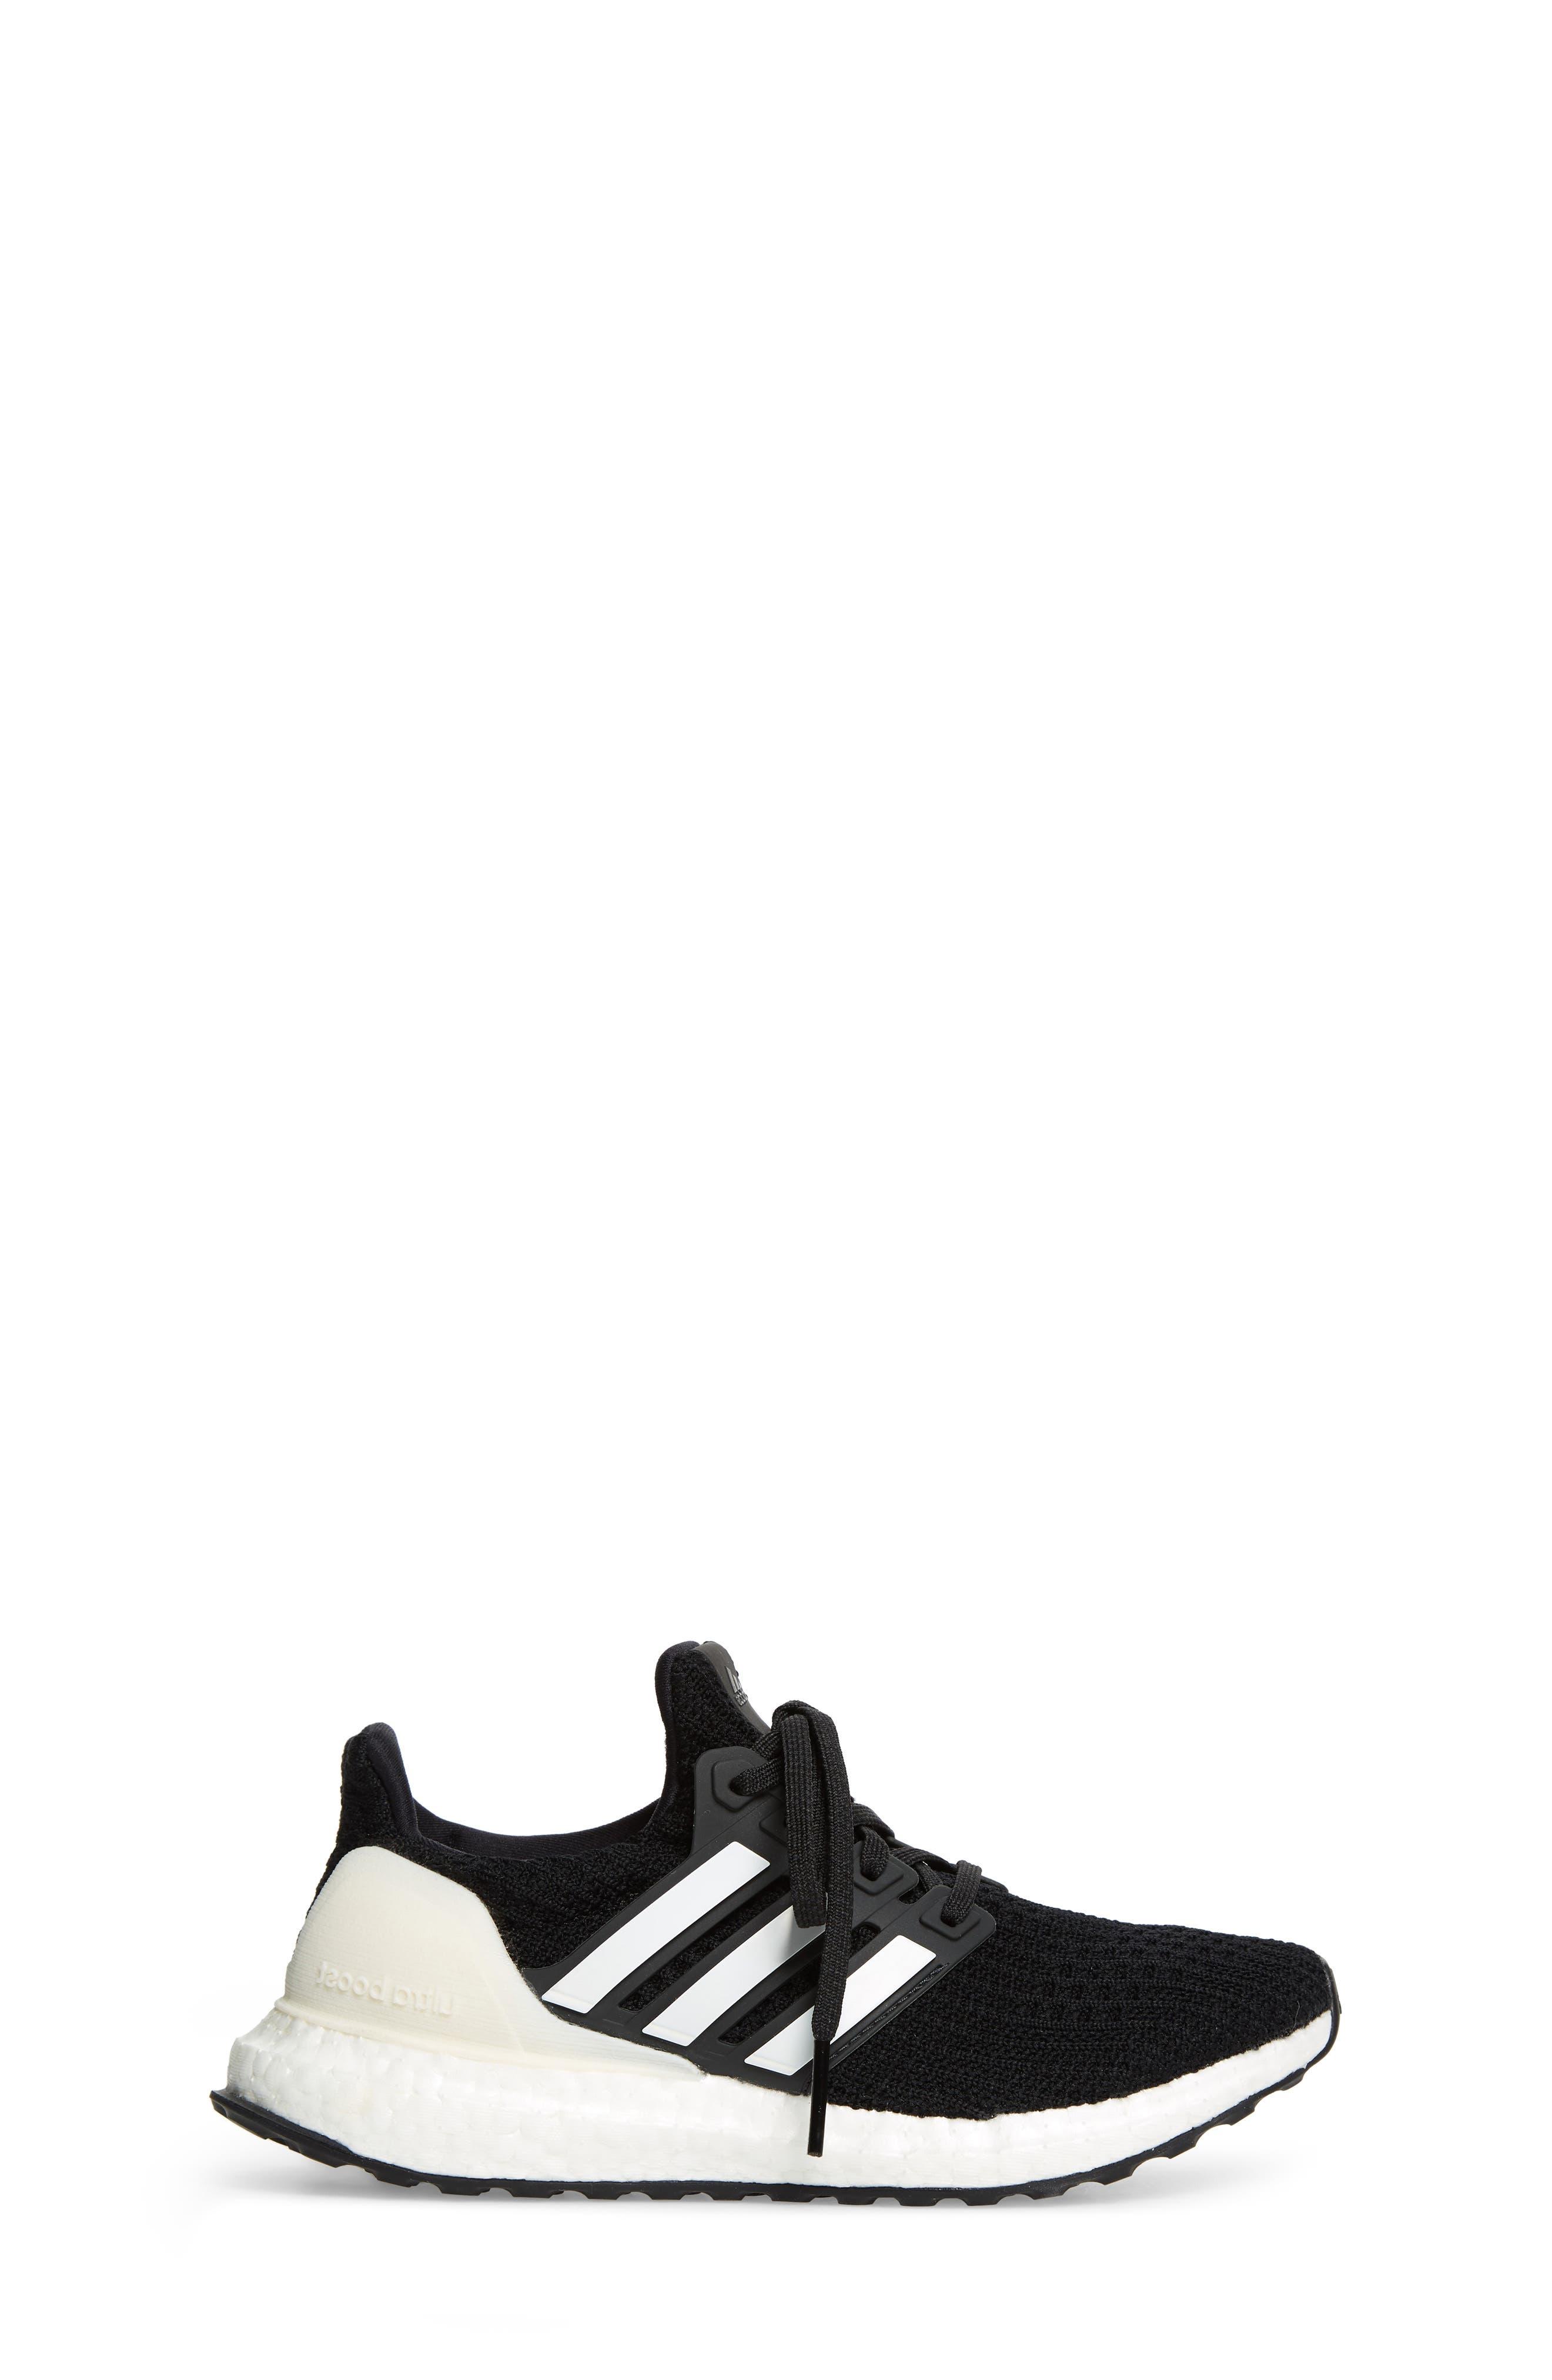 UltraBoost Sneaker,                             Alternate thumbnail 3, color,                             BLACK/ CLOUD WHITE/ CARBON